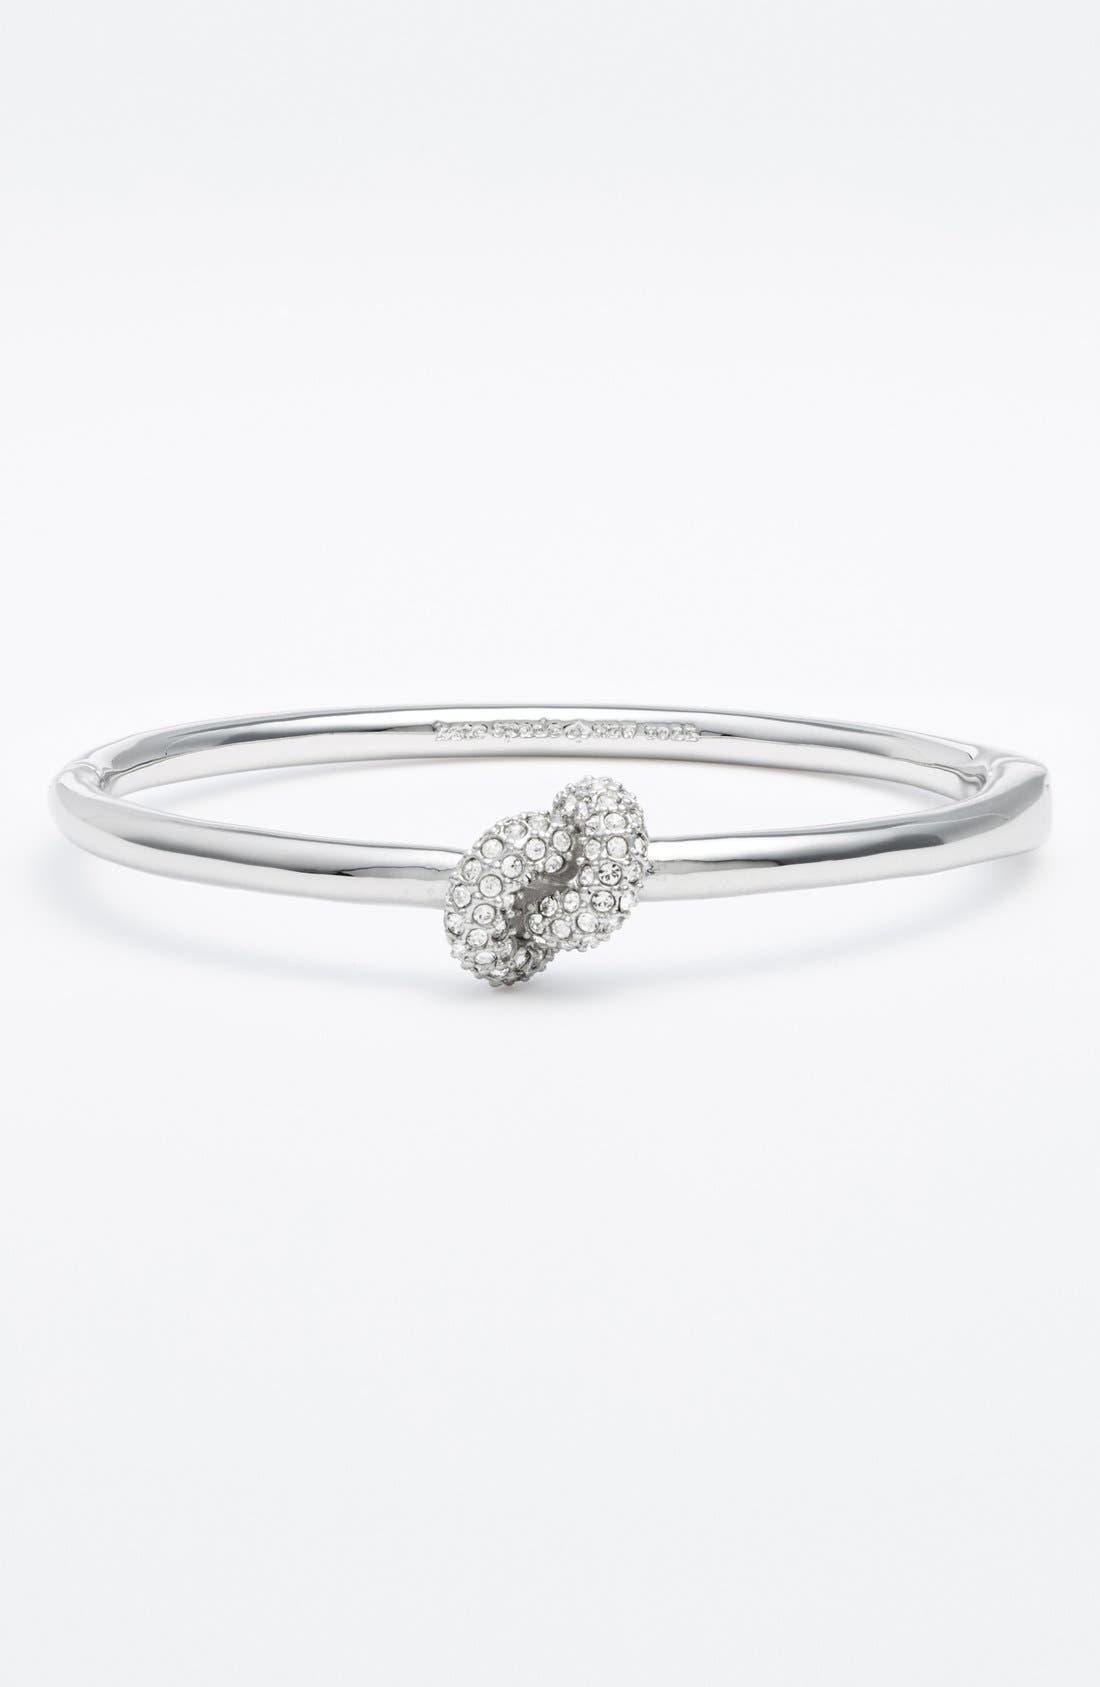 Main Image - kate spade new york 'sailors' knot' hinged bracelet